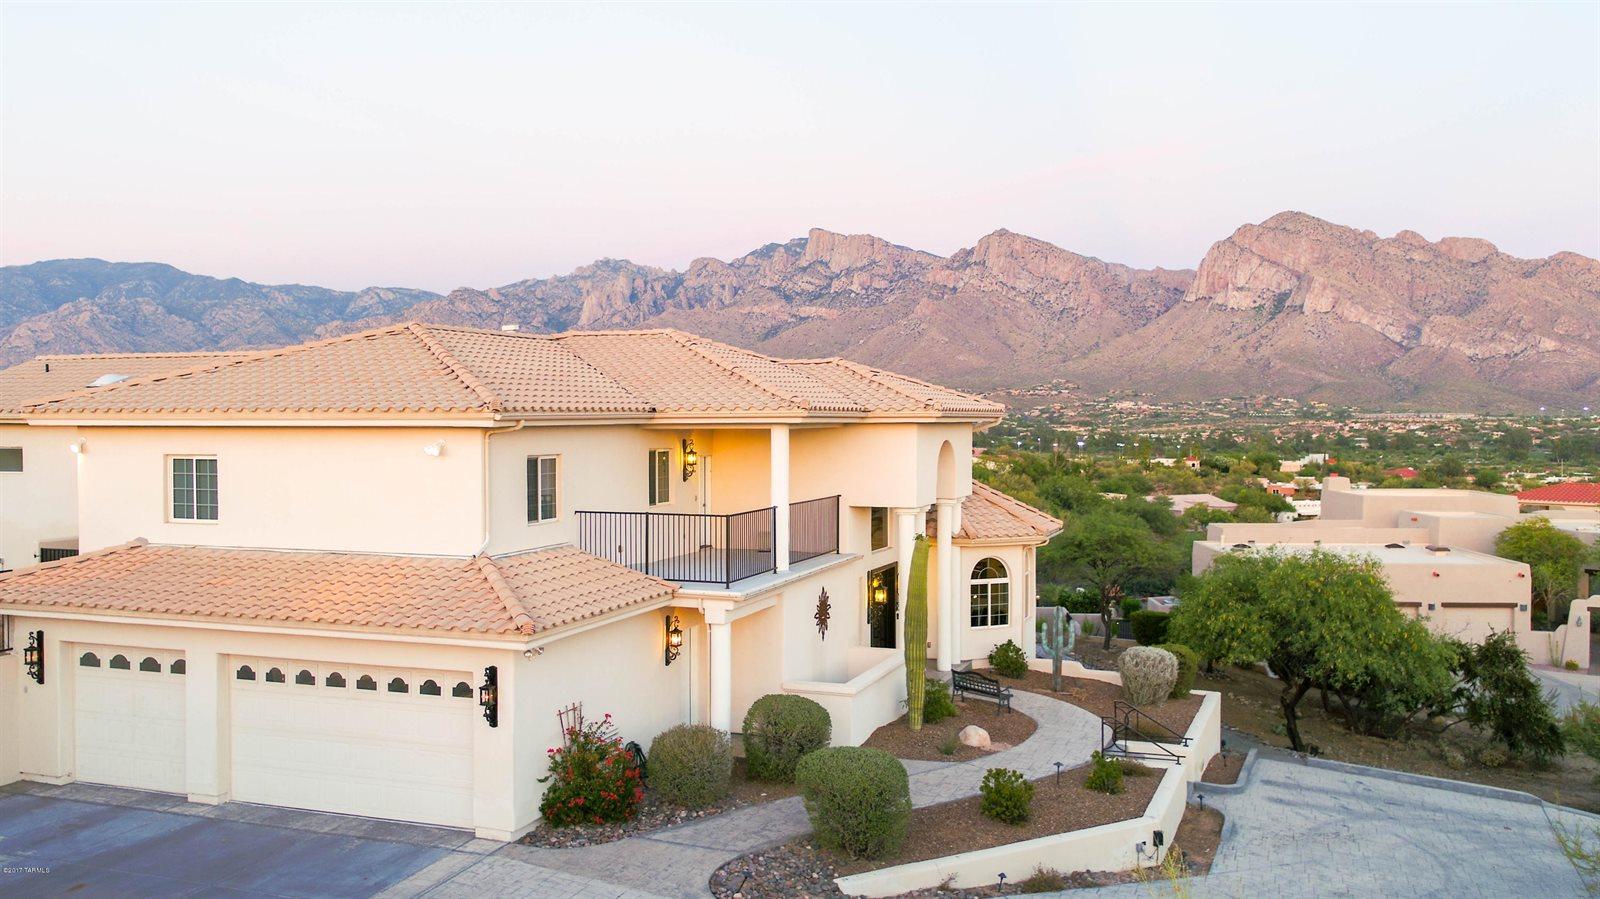 10750 North Summer Moon Place, Tucson, AZ 85737